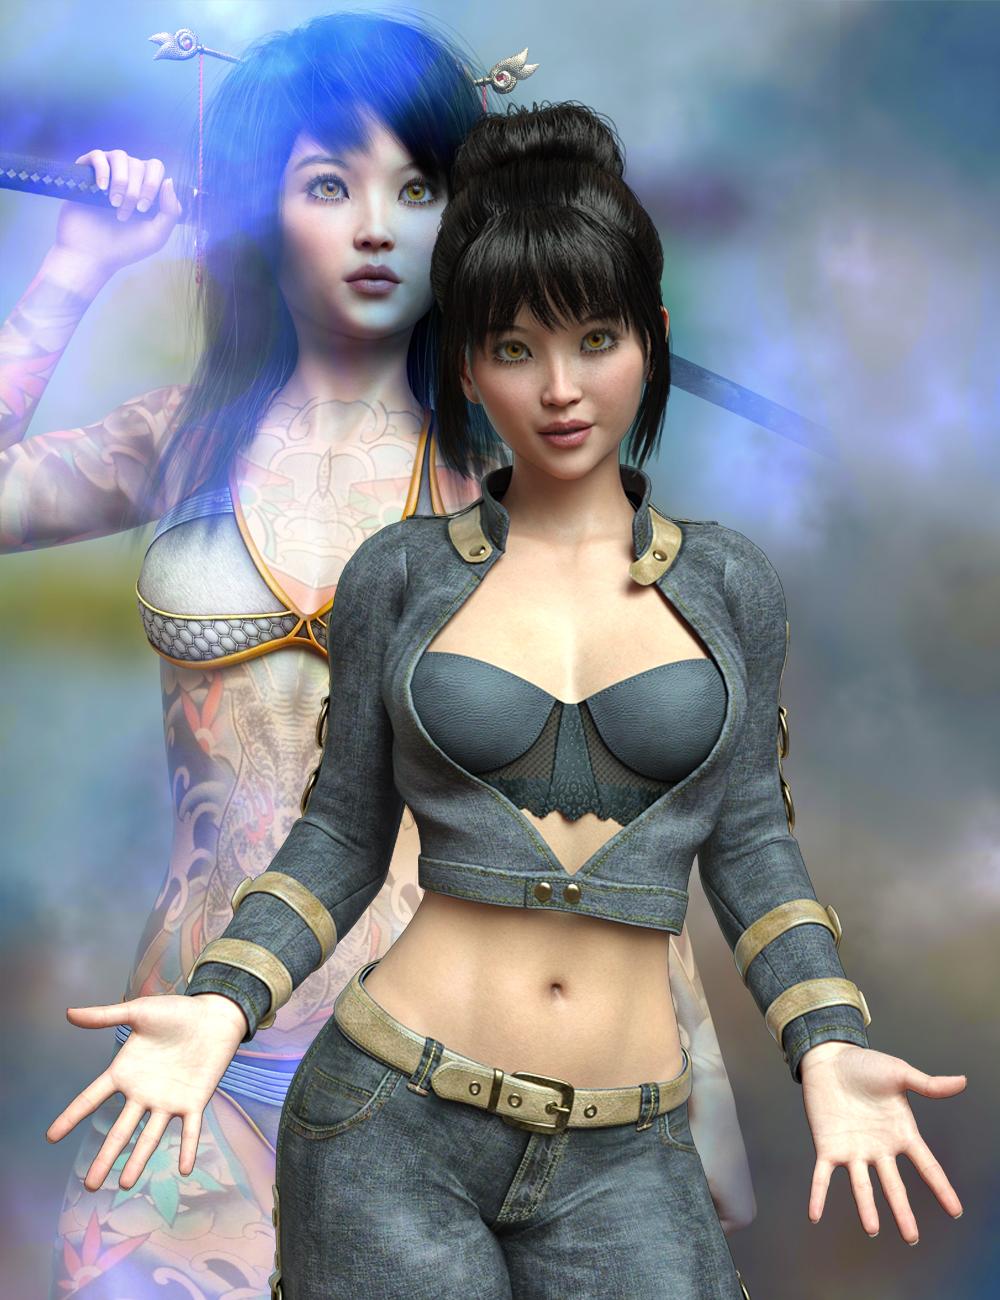 MR Yasmin for Genesis 8.1 Female by: Marcius, 3D Models by Daz 3D